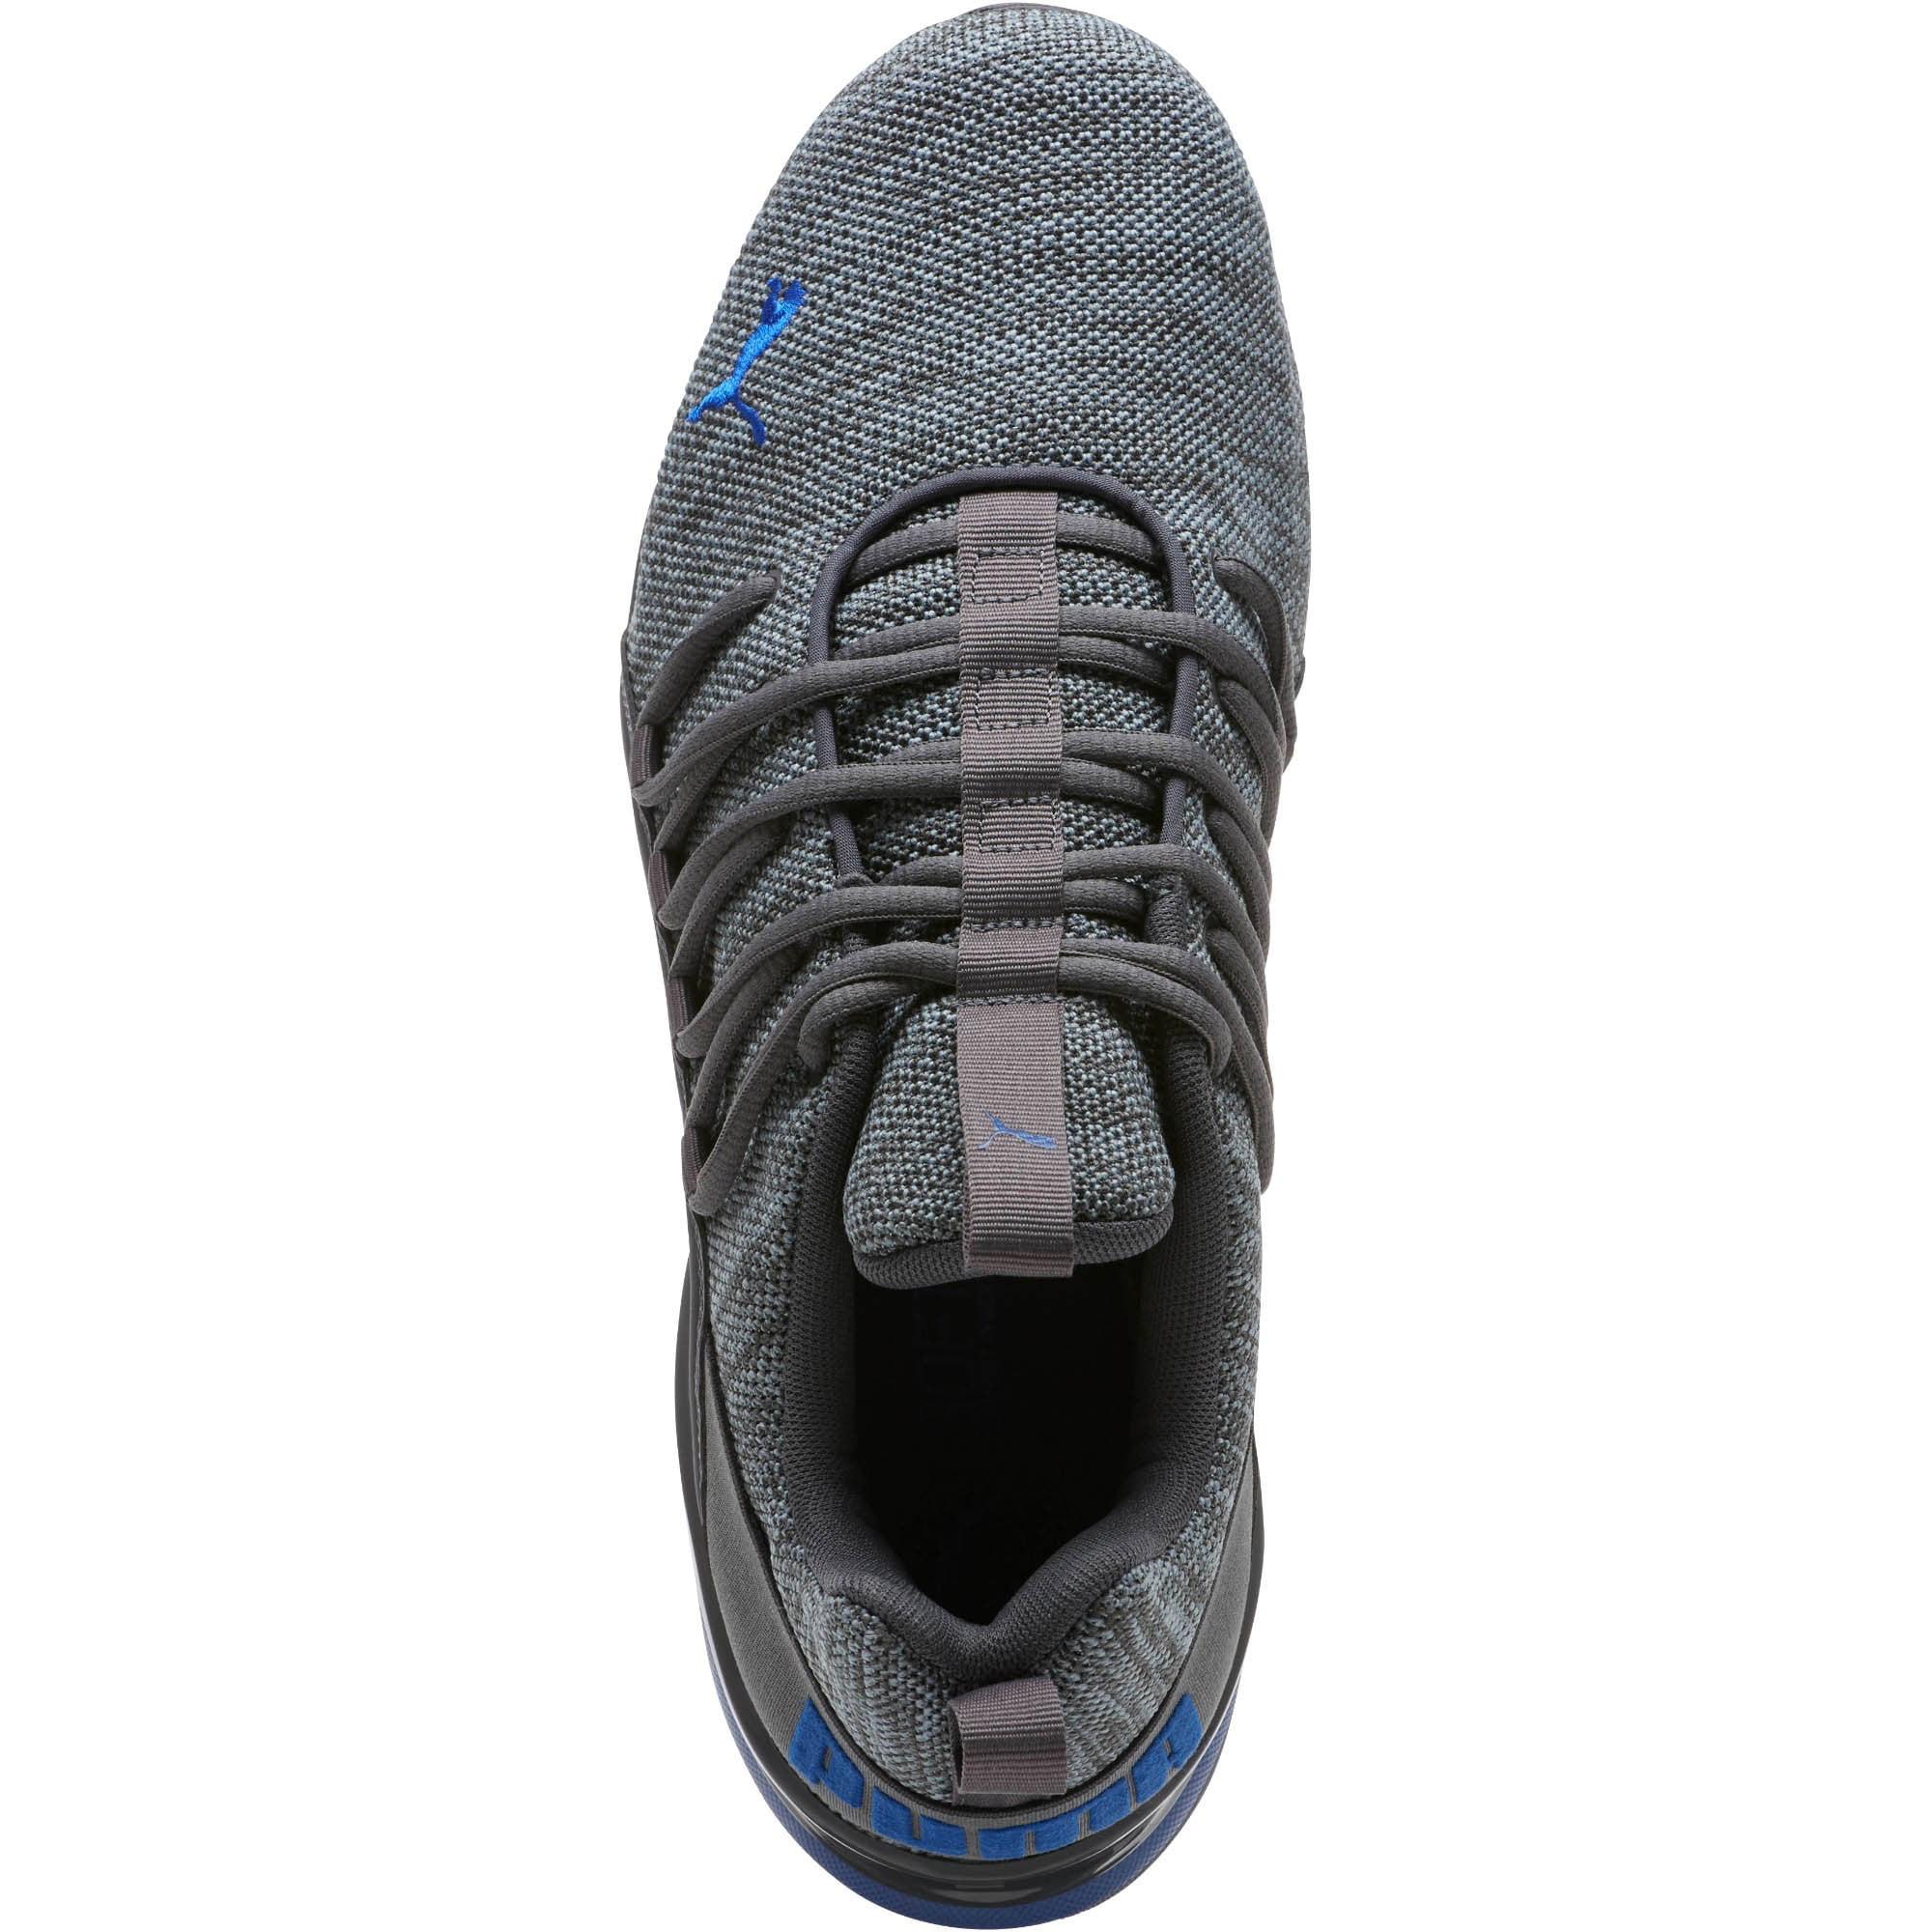 6d99b9635105 PUMA - PUMA Men s AXELION Sneaker